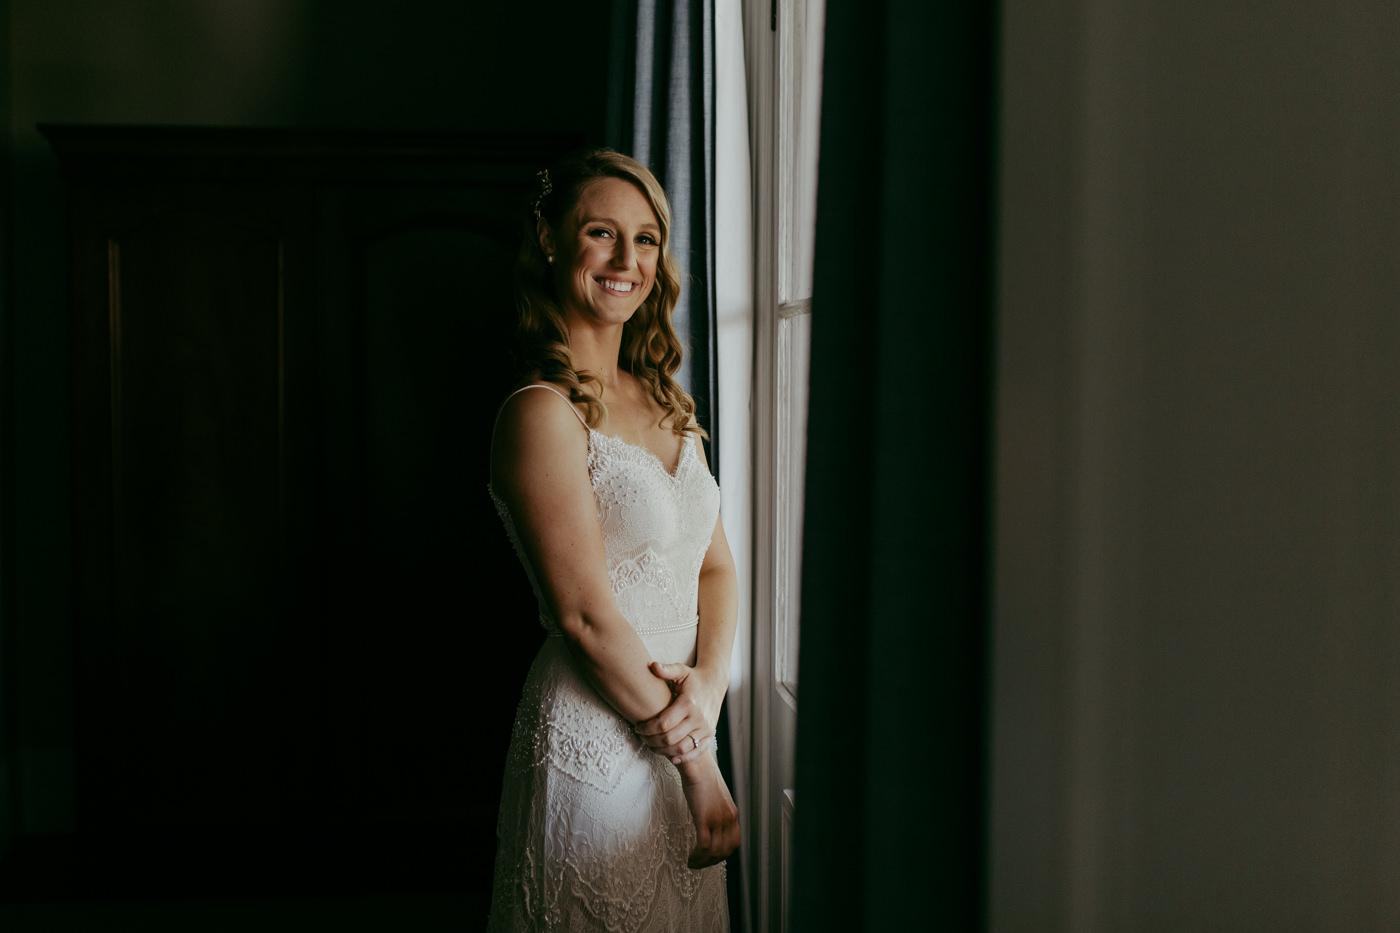 Anthony & Eliet - Wagga Wagga Wedding - Country NSW - Samantha Heather Photography-31.jpg